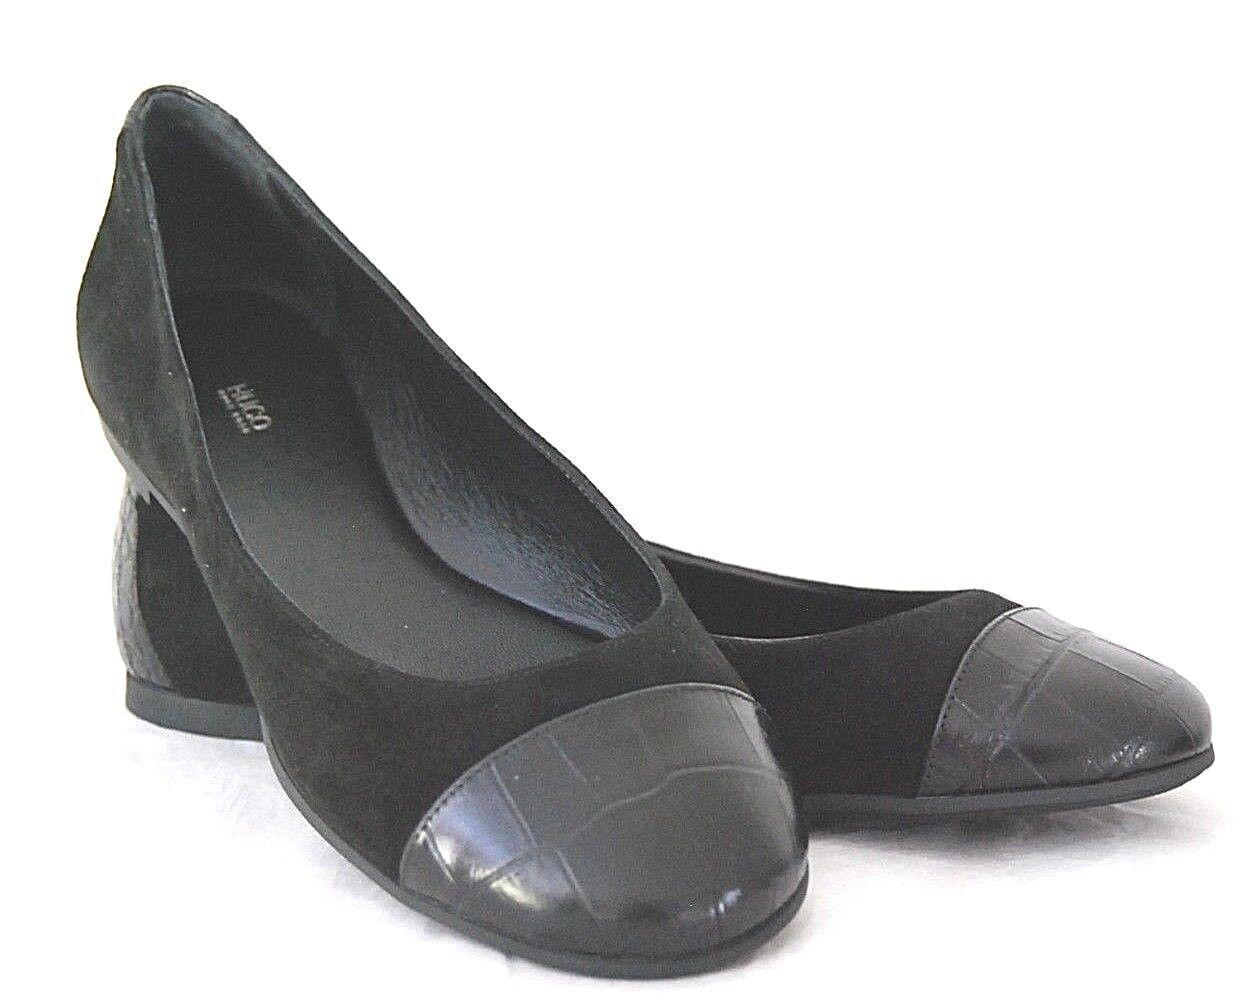 HUGO BOSS Ballerinas Gr. 38 Neu Camilla schwarz  Leder ROT Label Schuhe Pumps HB